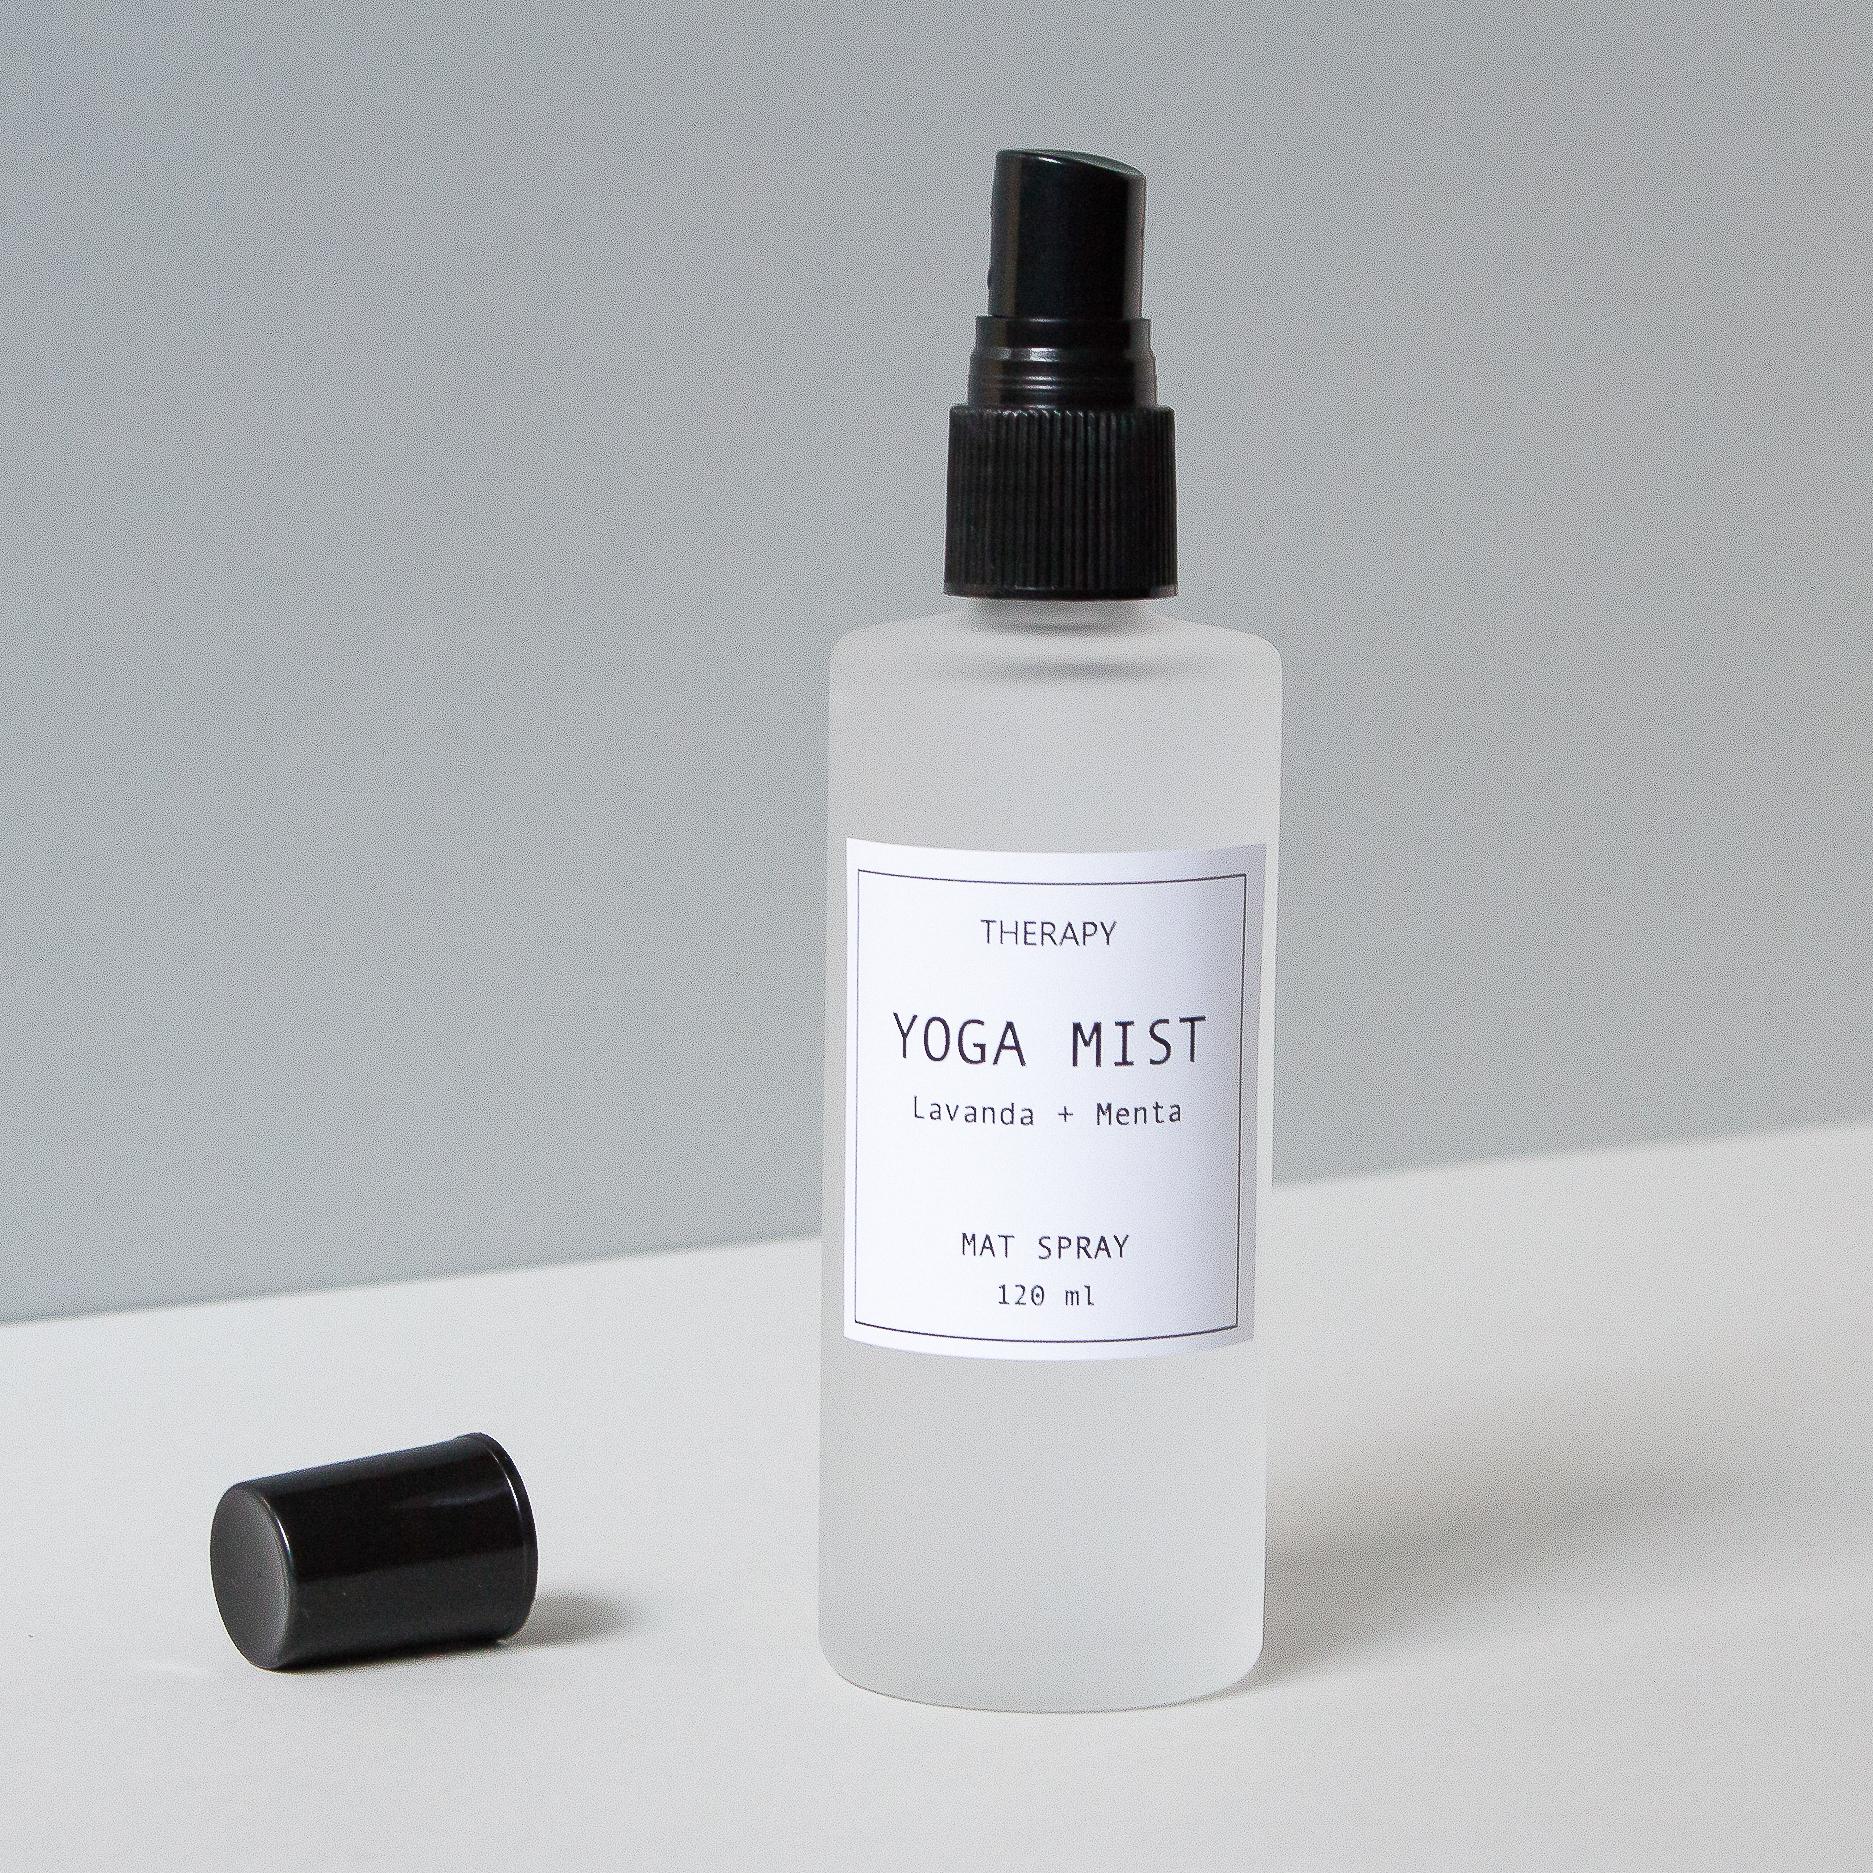 therapy_mat spray_yoga mist.jpg